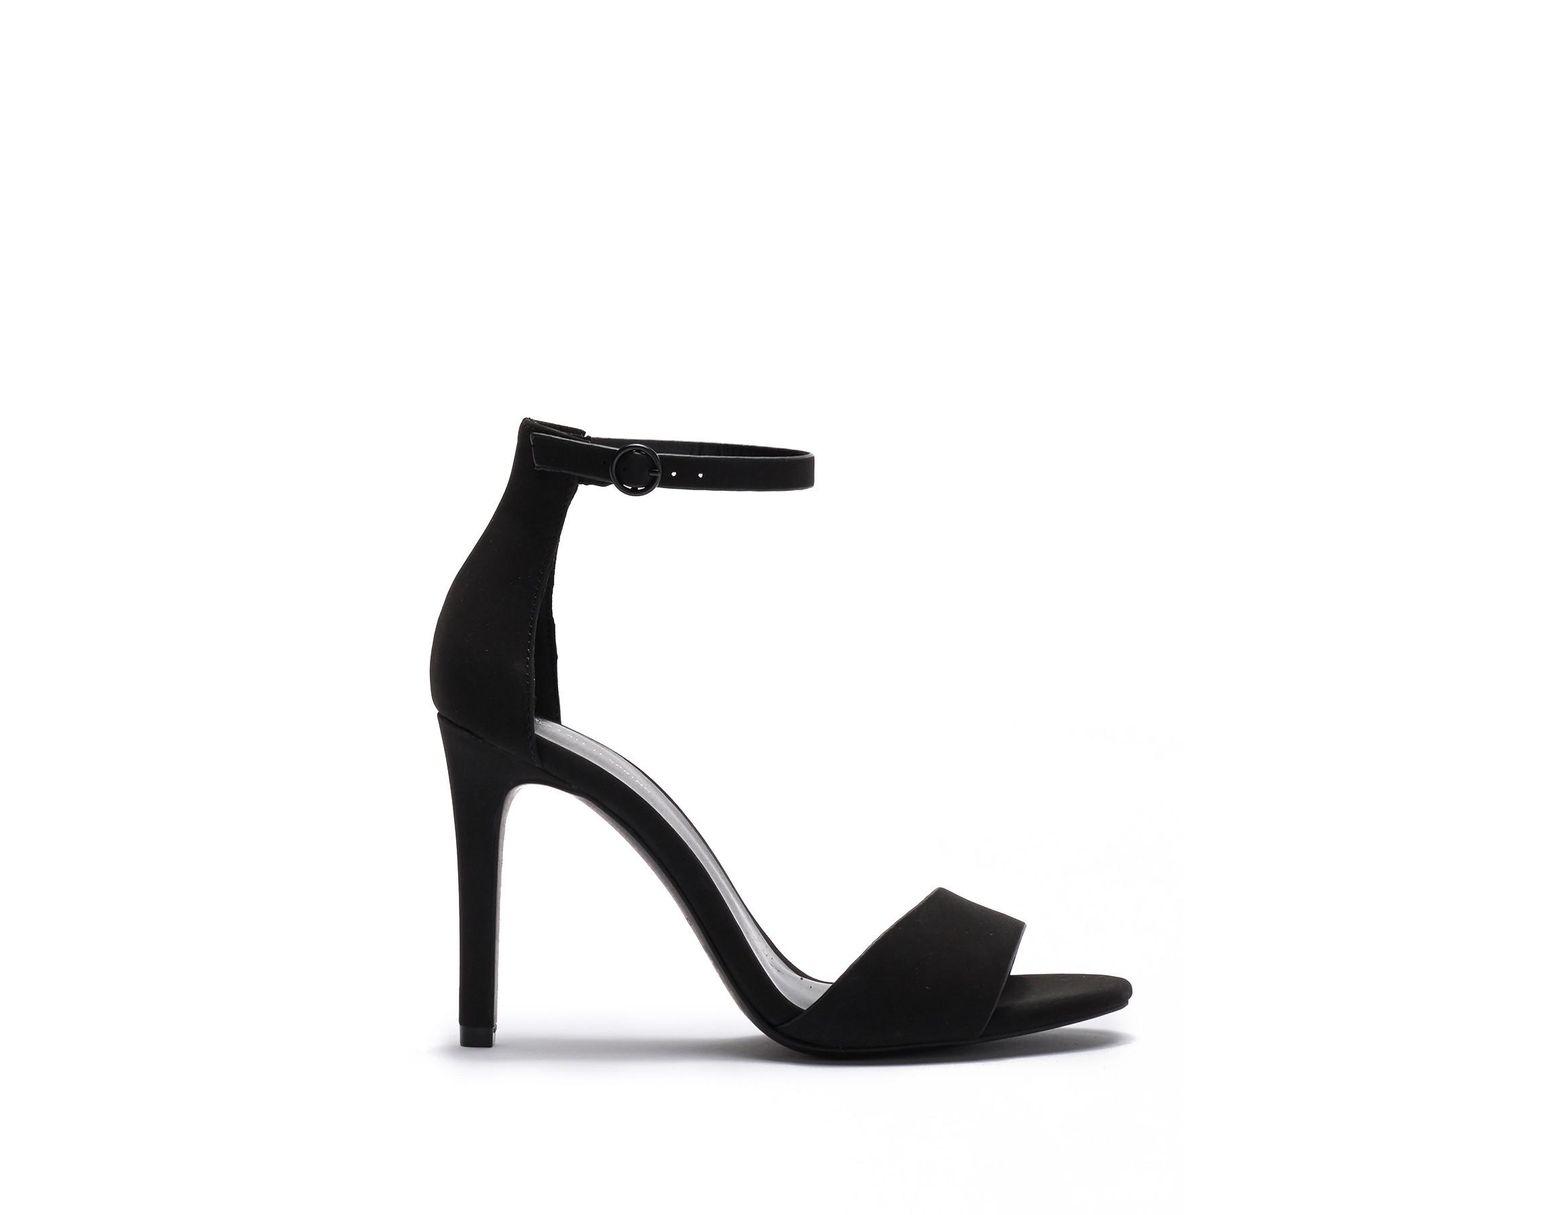 42aaf354c3 Call It Spring Dellmar Ankle Strap Sandal in Black - Lyst